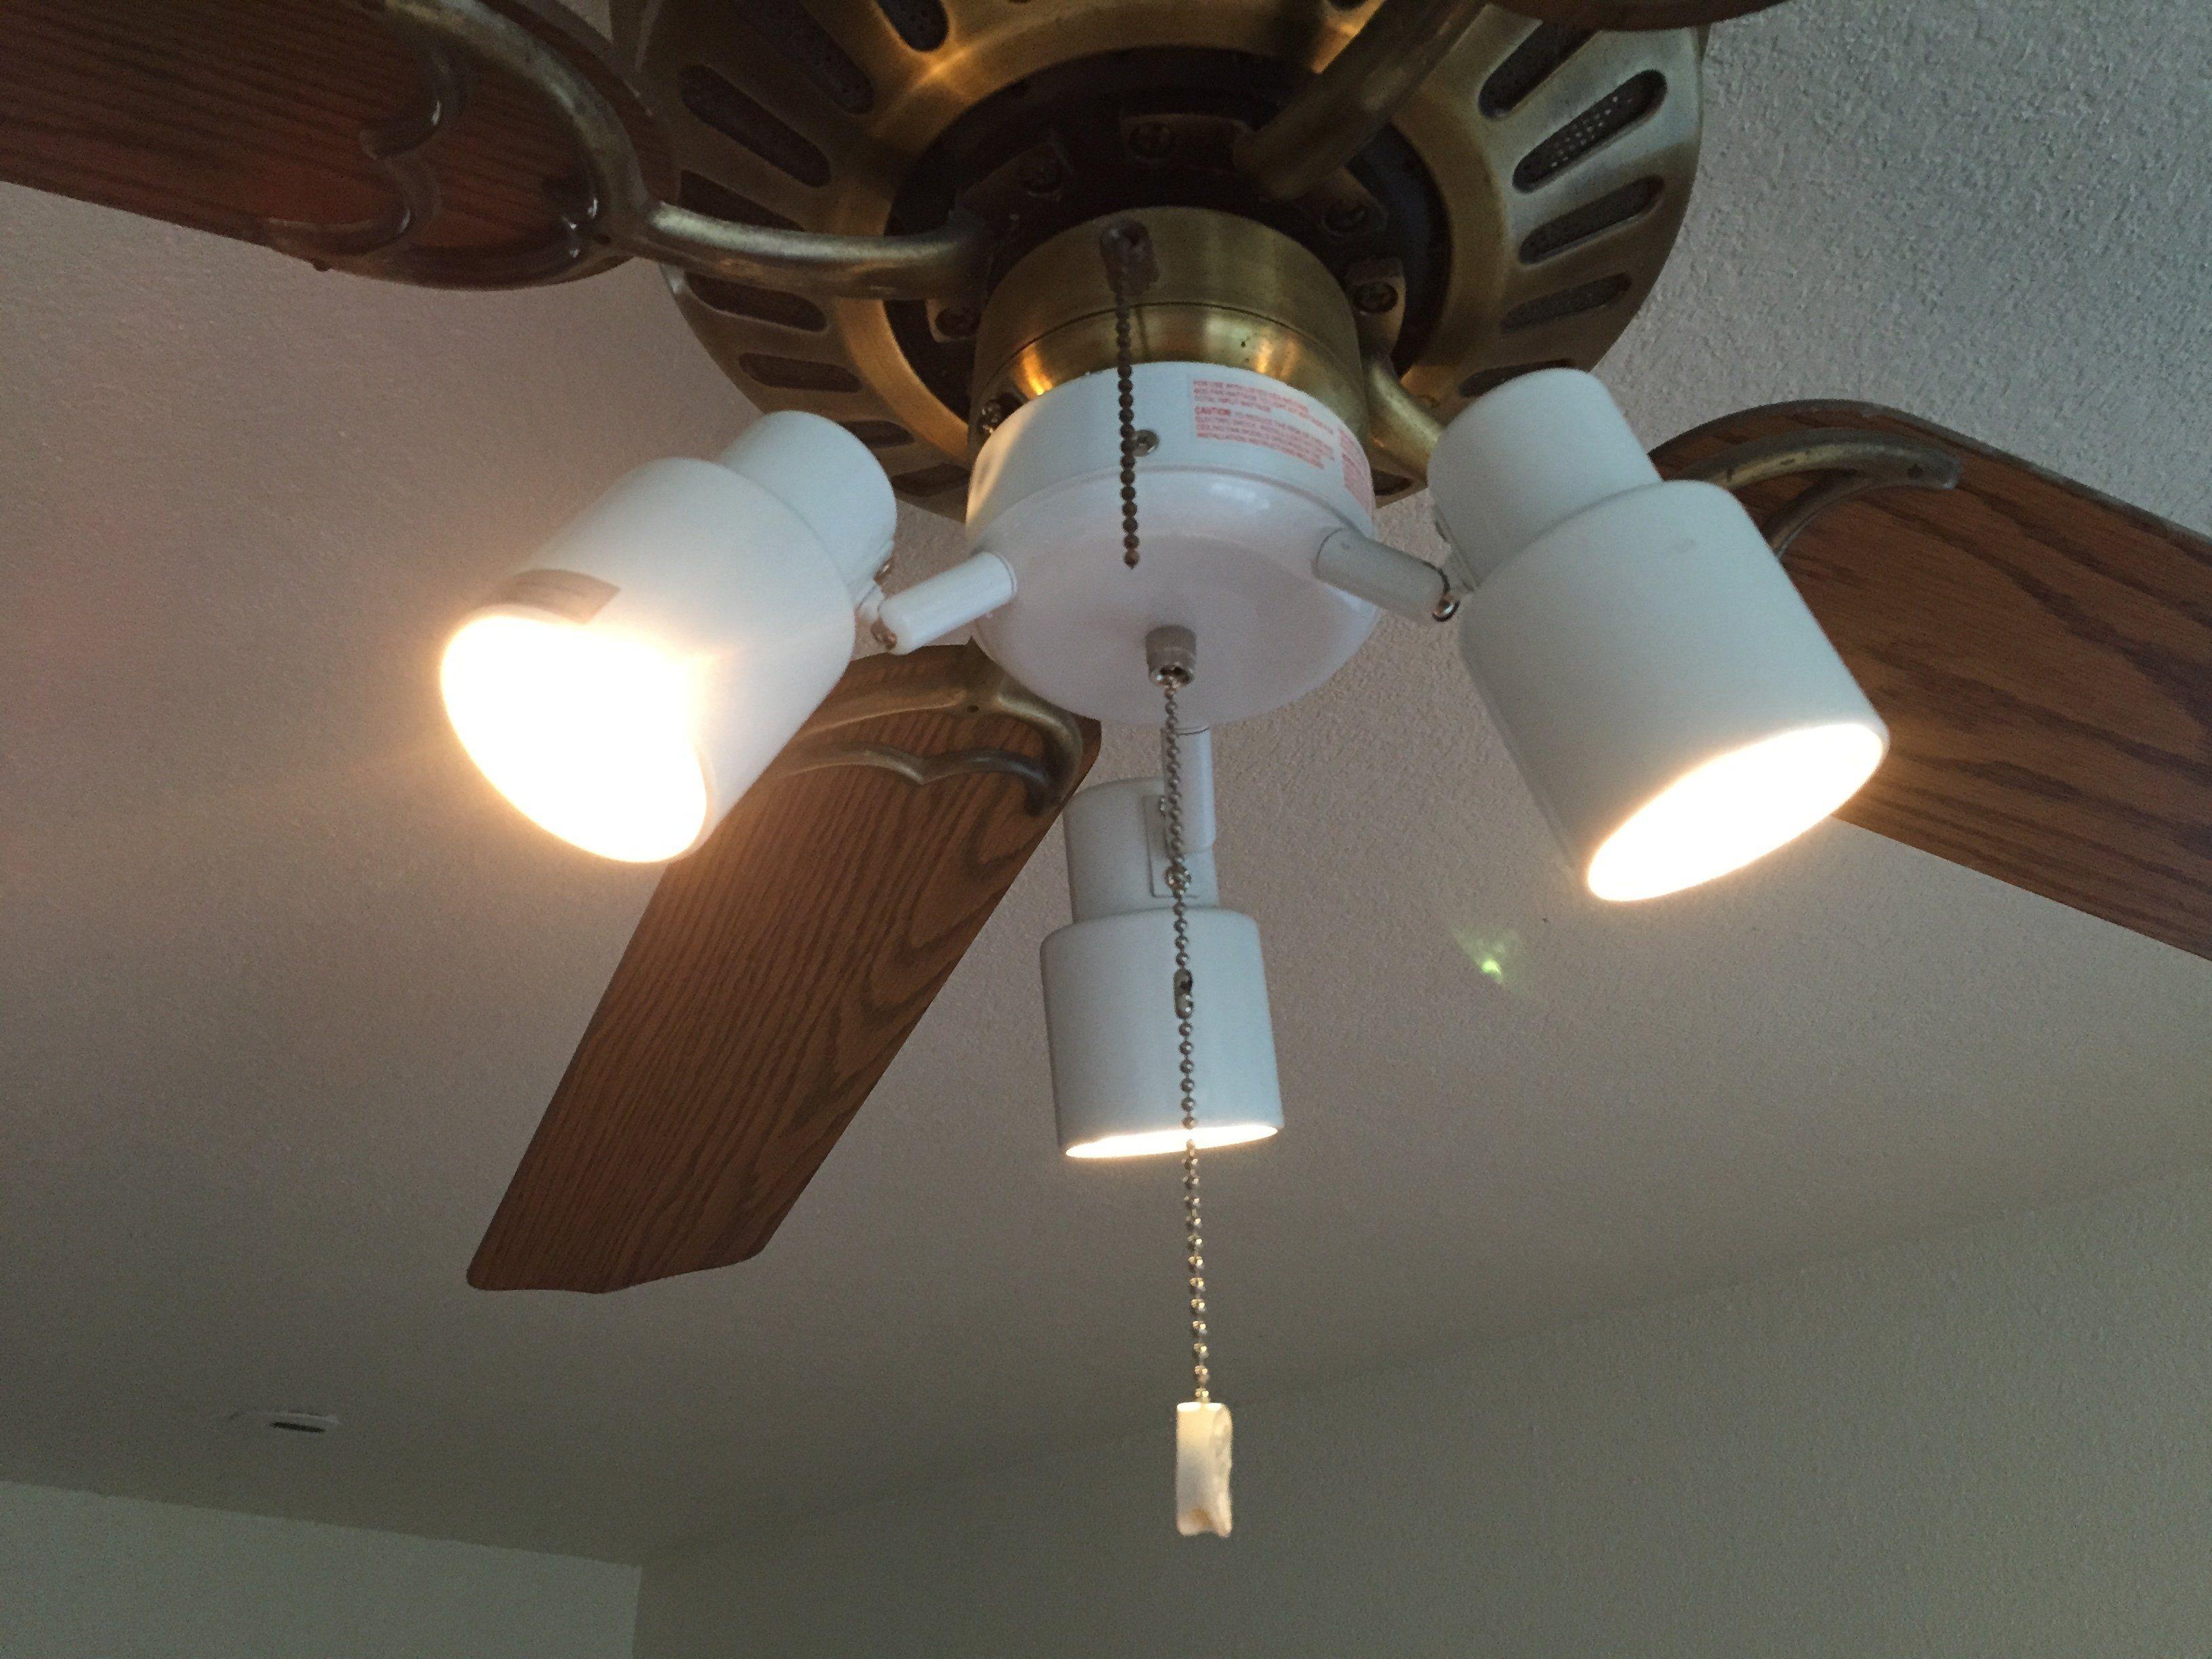 Ceiling Fan Light Fixture Replacement Ceiling Fan Light Fixtures Ceiling Fan Ceiling Fan With Light